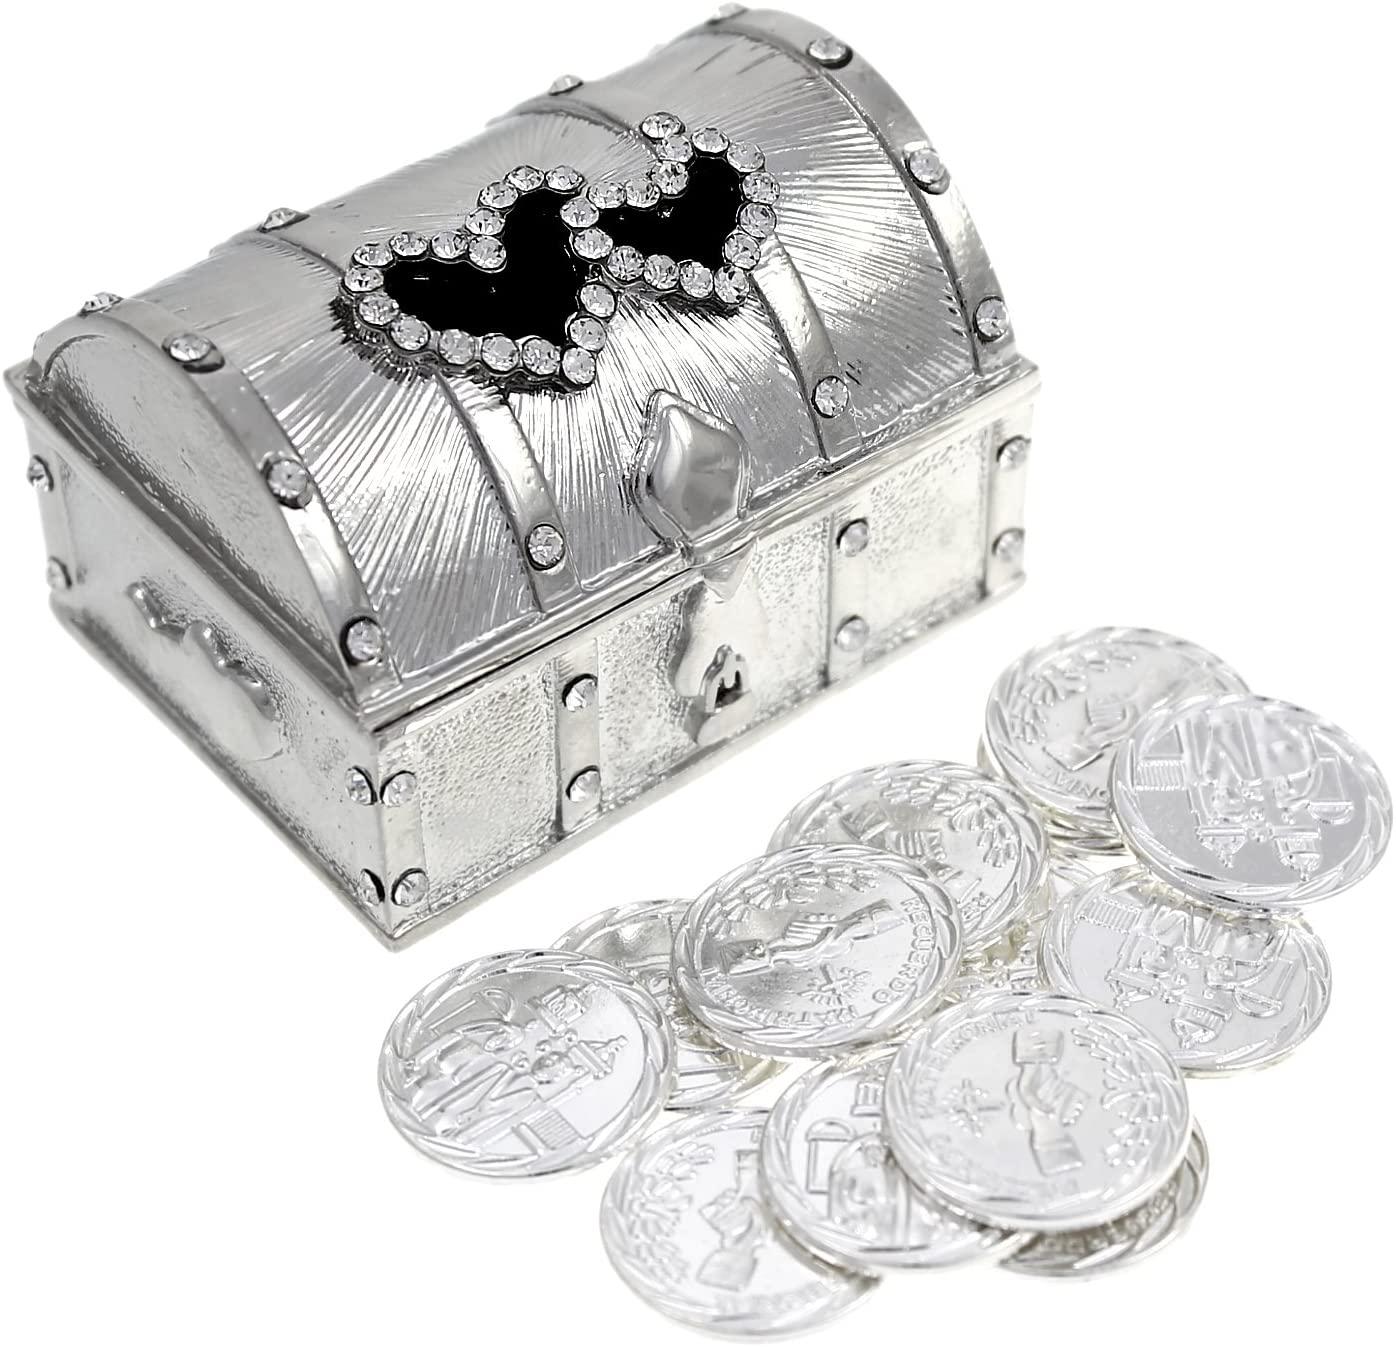 Wedding Unity Coin Set - Arras de Boda - Double Heart Box with Decorative Rhinestone Crystals 68 (Silver)